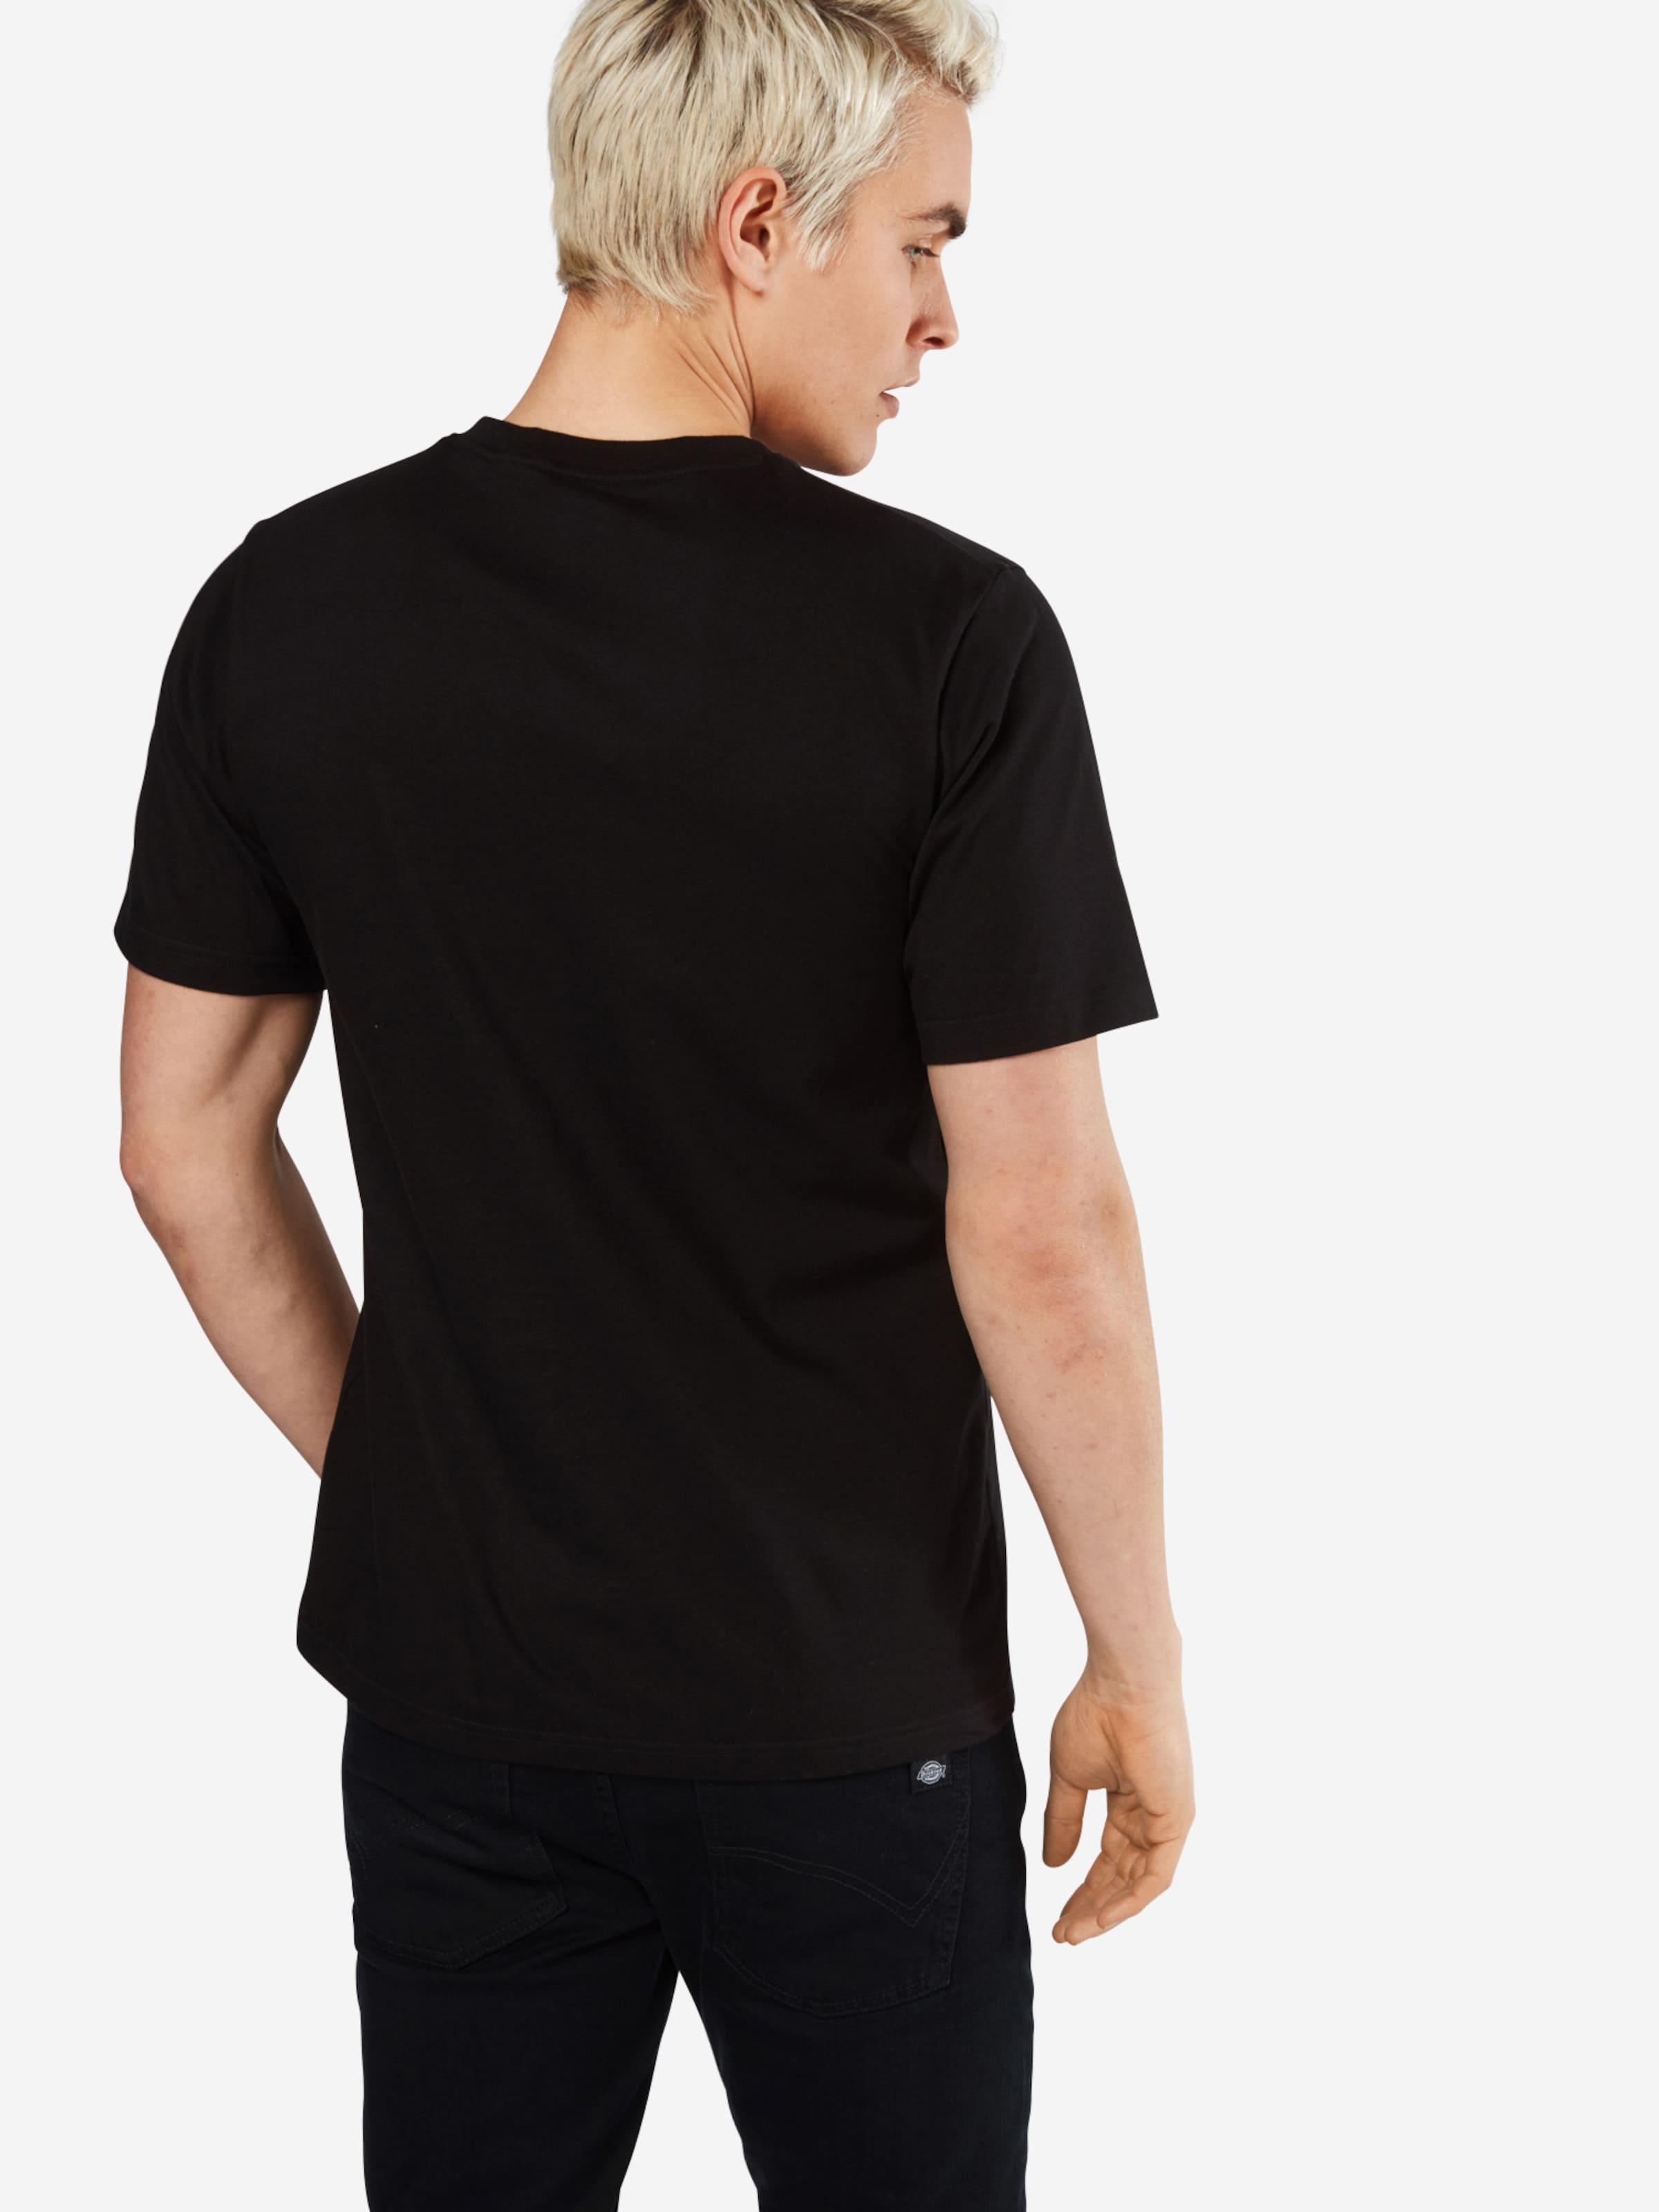 DICKIES T-Shirt 'Stockdale' Wählen Sie Eine Beste Günstig Online XXHkus0VVf